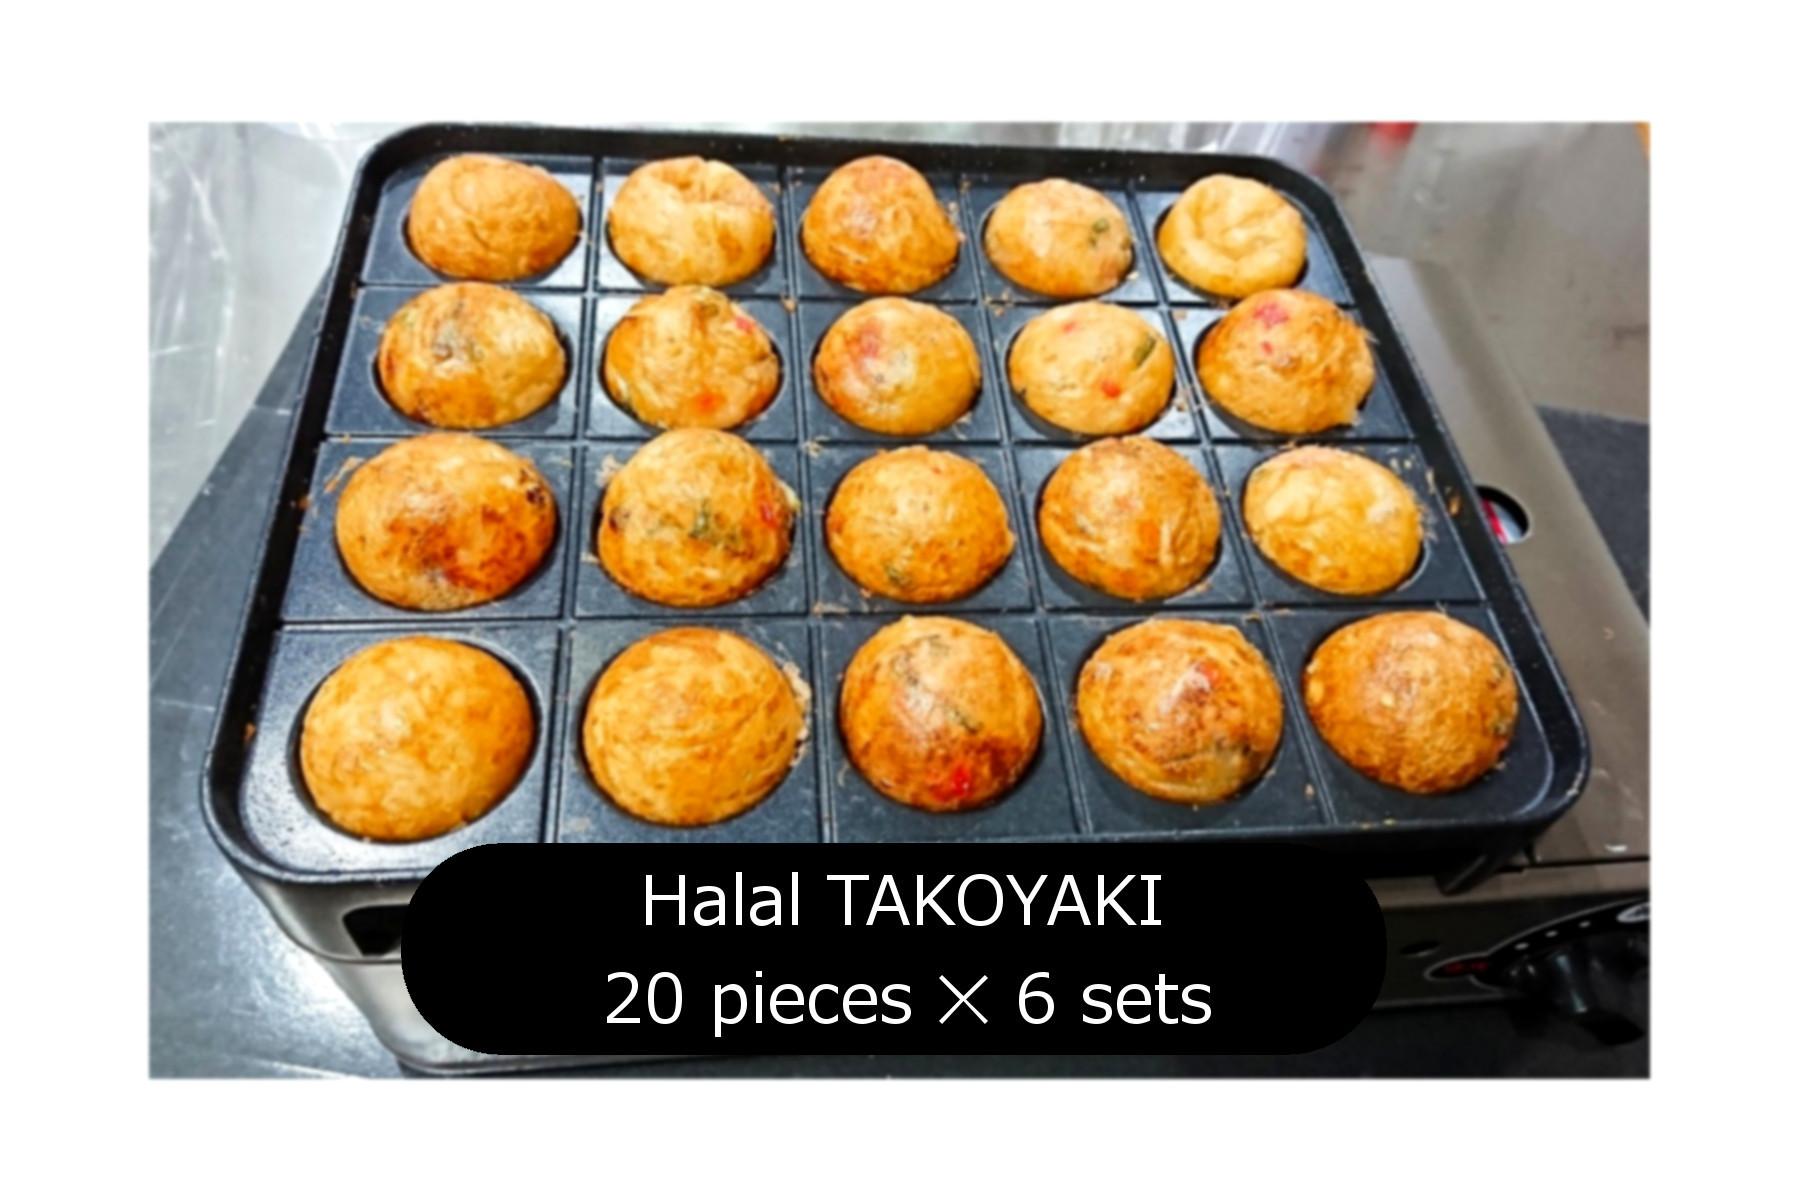 Halal TAKOYAKI Serves 6